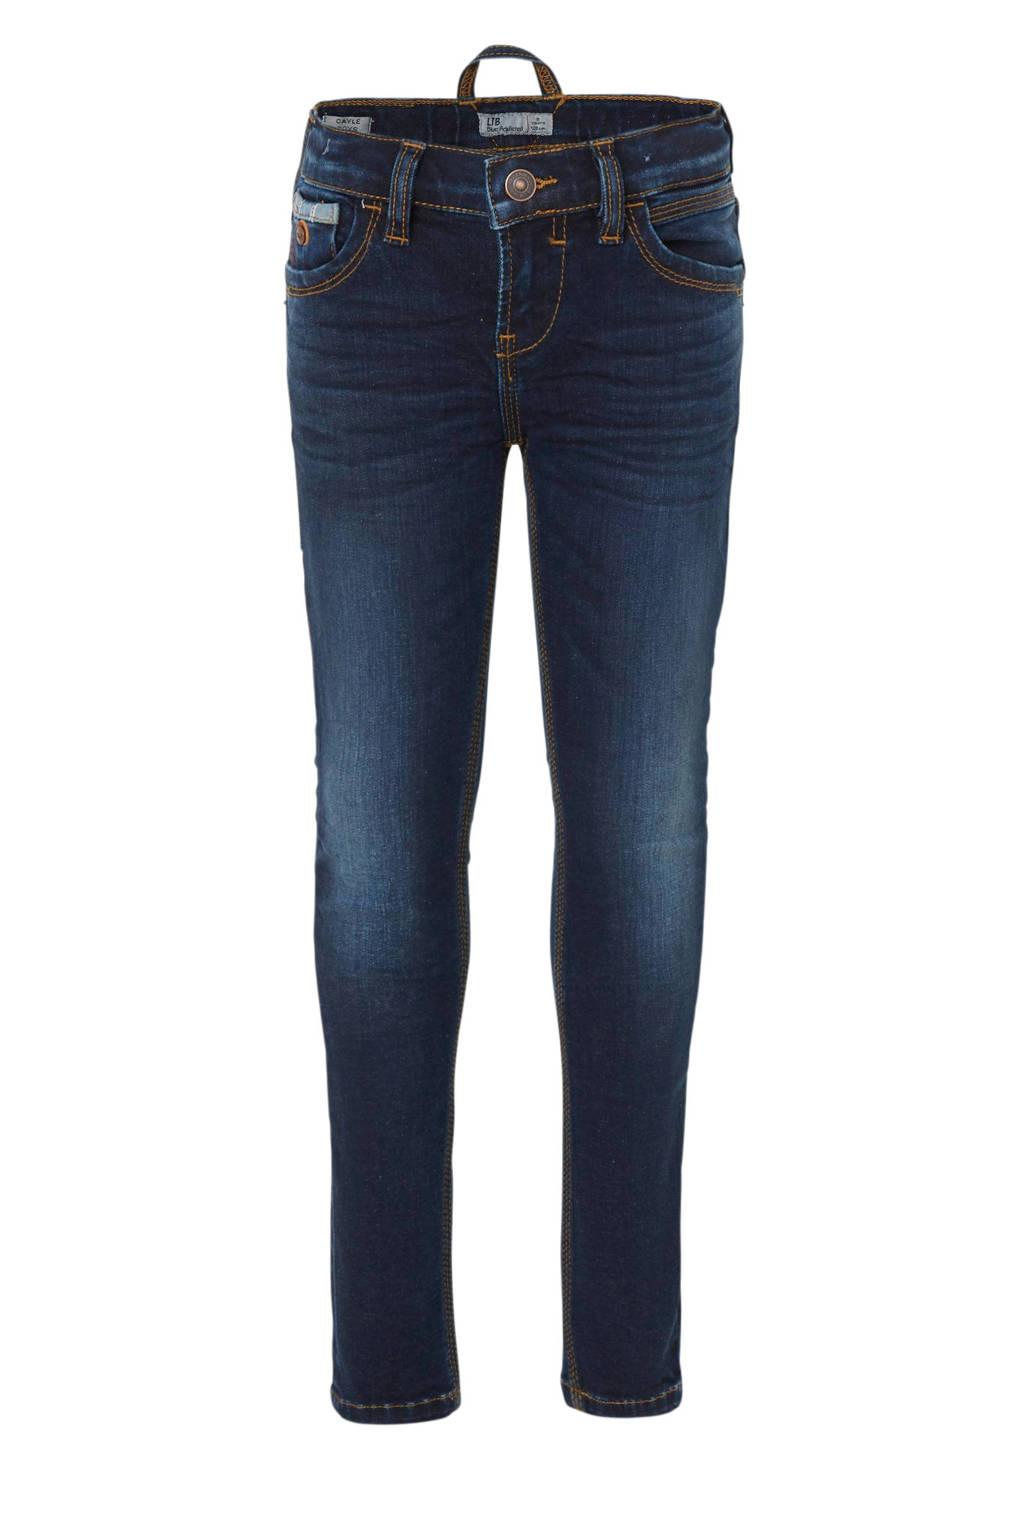 LTB skinny fit jeans Cayle dark denim, Dark denim (Arlin wash)